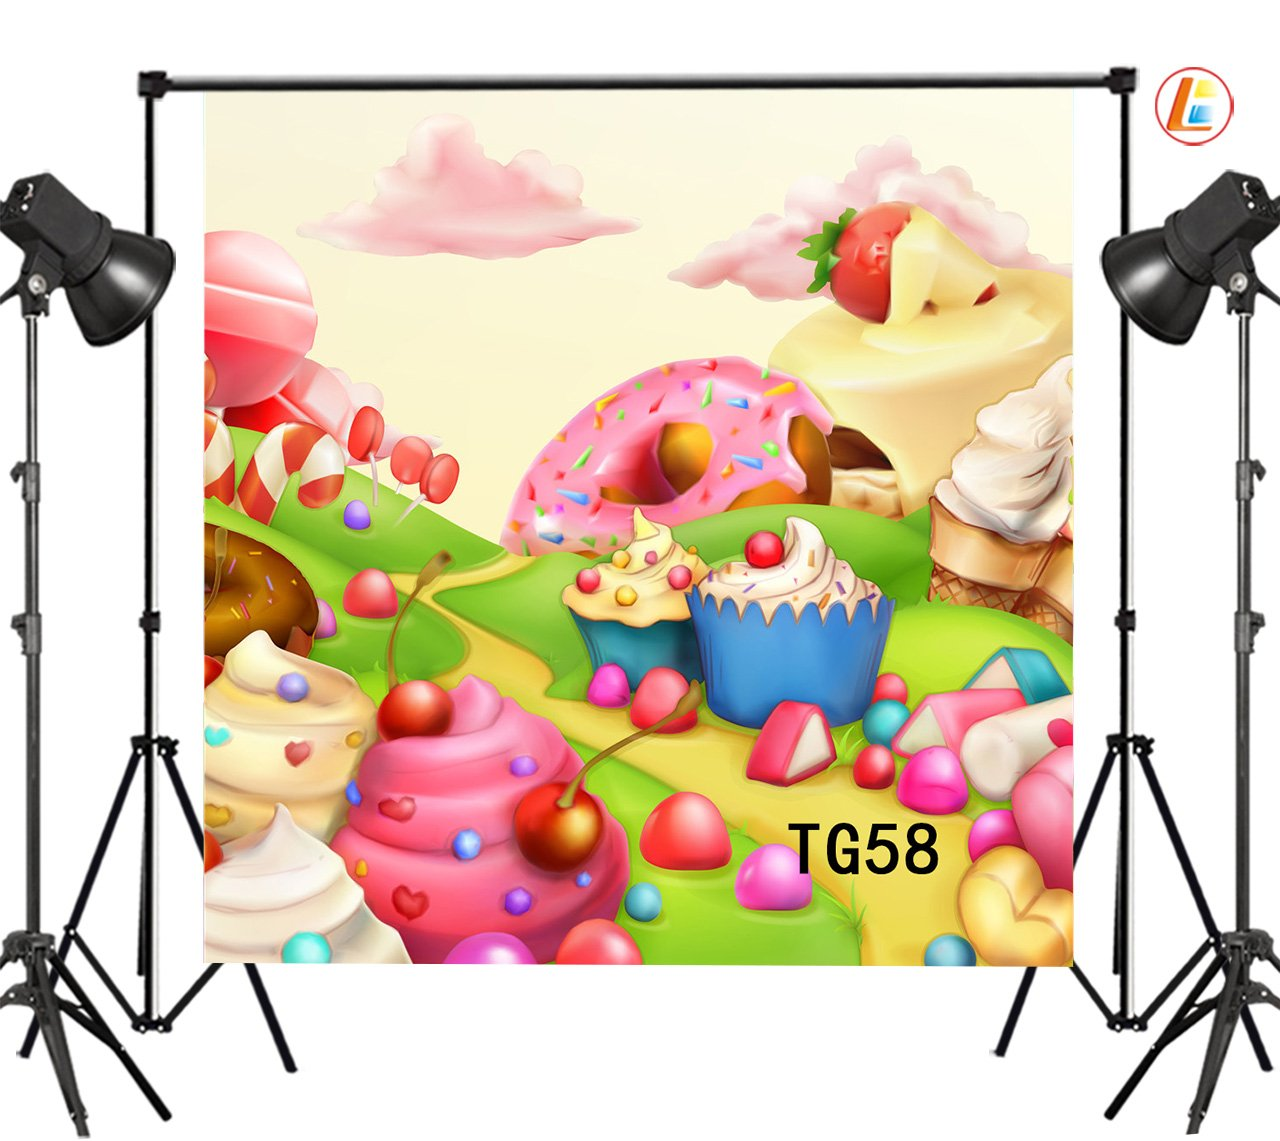 LB 8X8ft Doughnut Strawberry Cake Candy Vinyl Photography Backdrop Customized Newborn Baby Kids Photo Background Studio Prop TG58